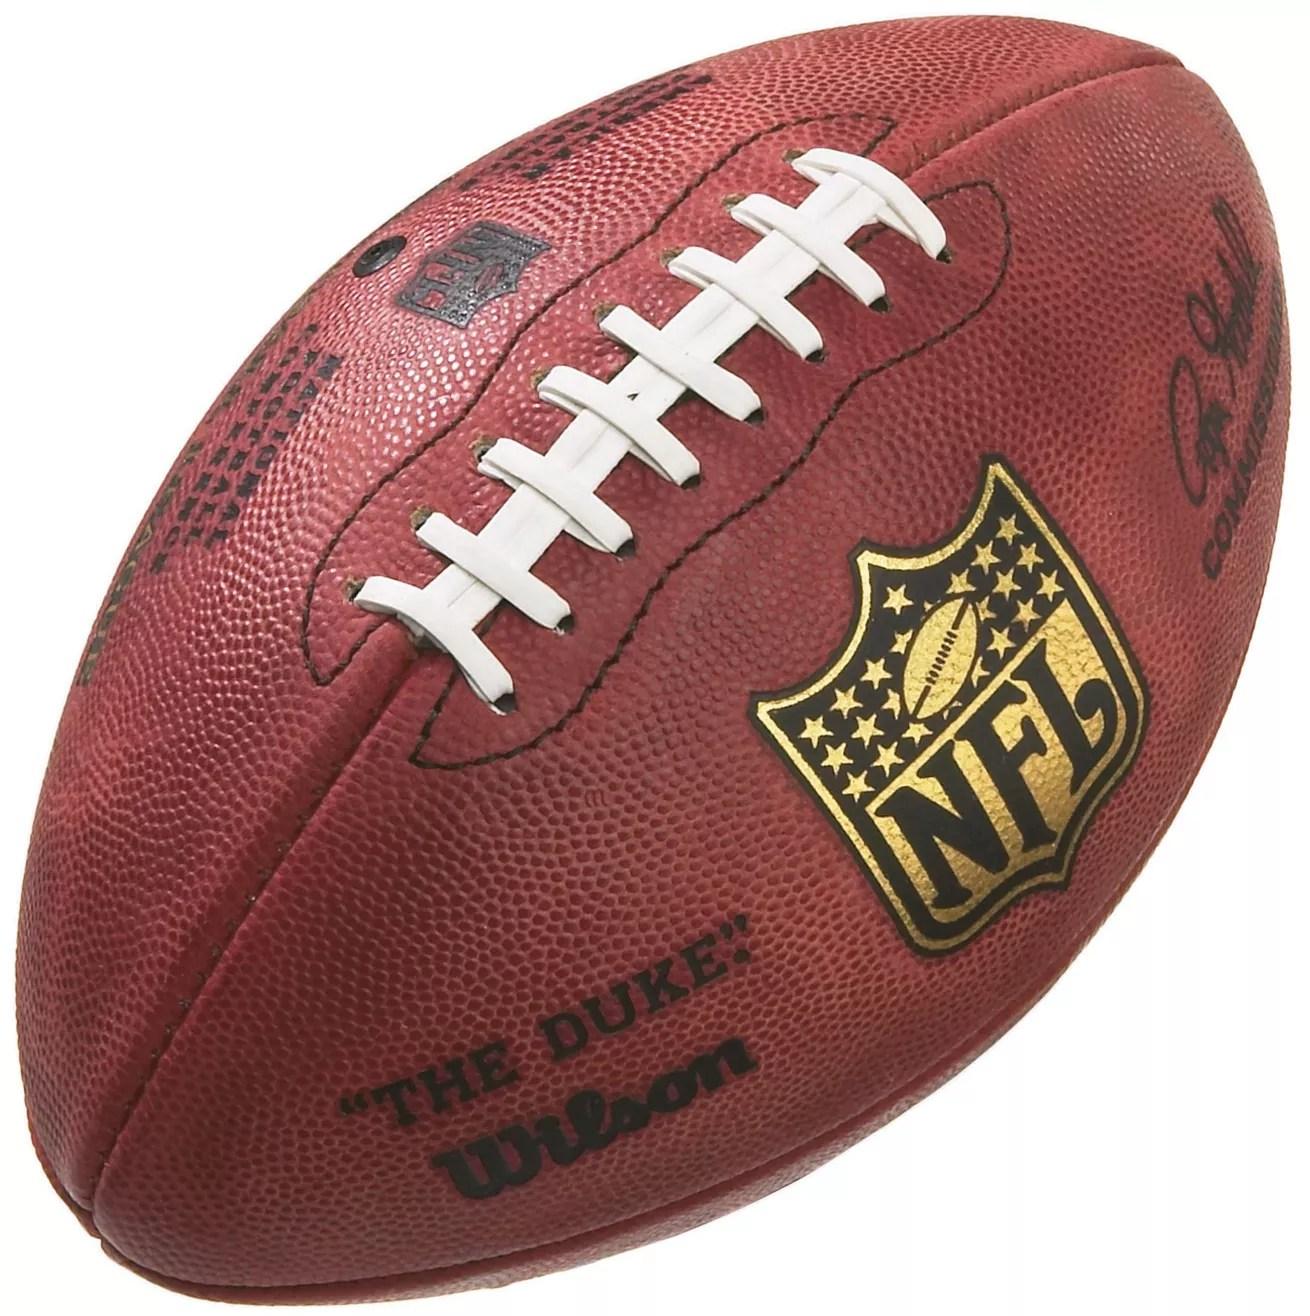 Nfl Wilson Game Football